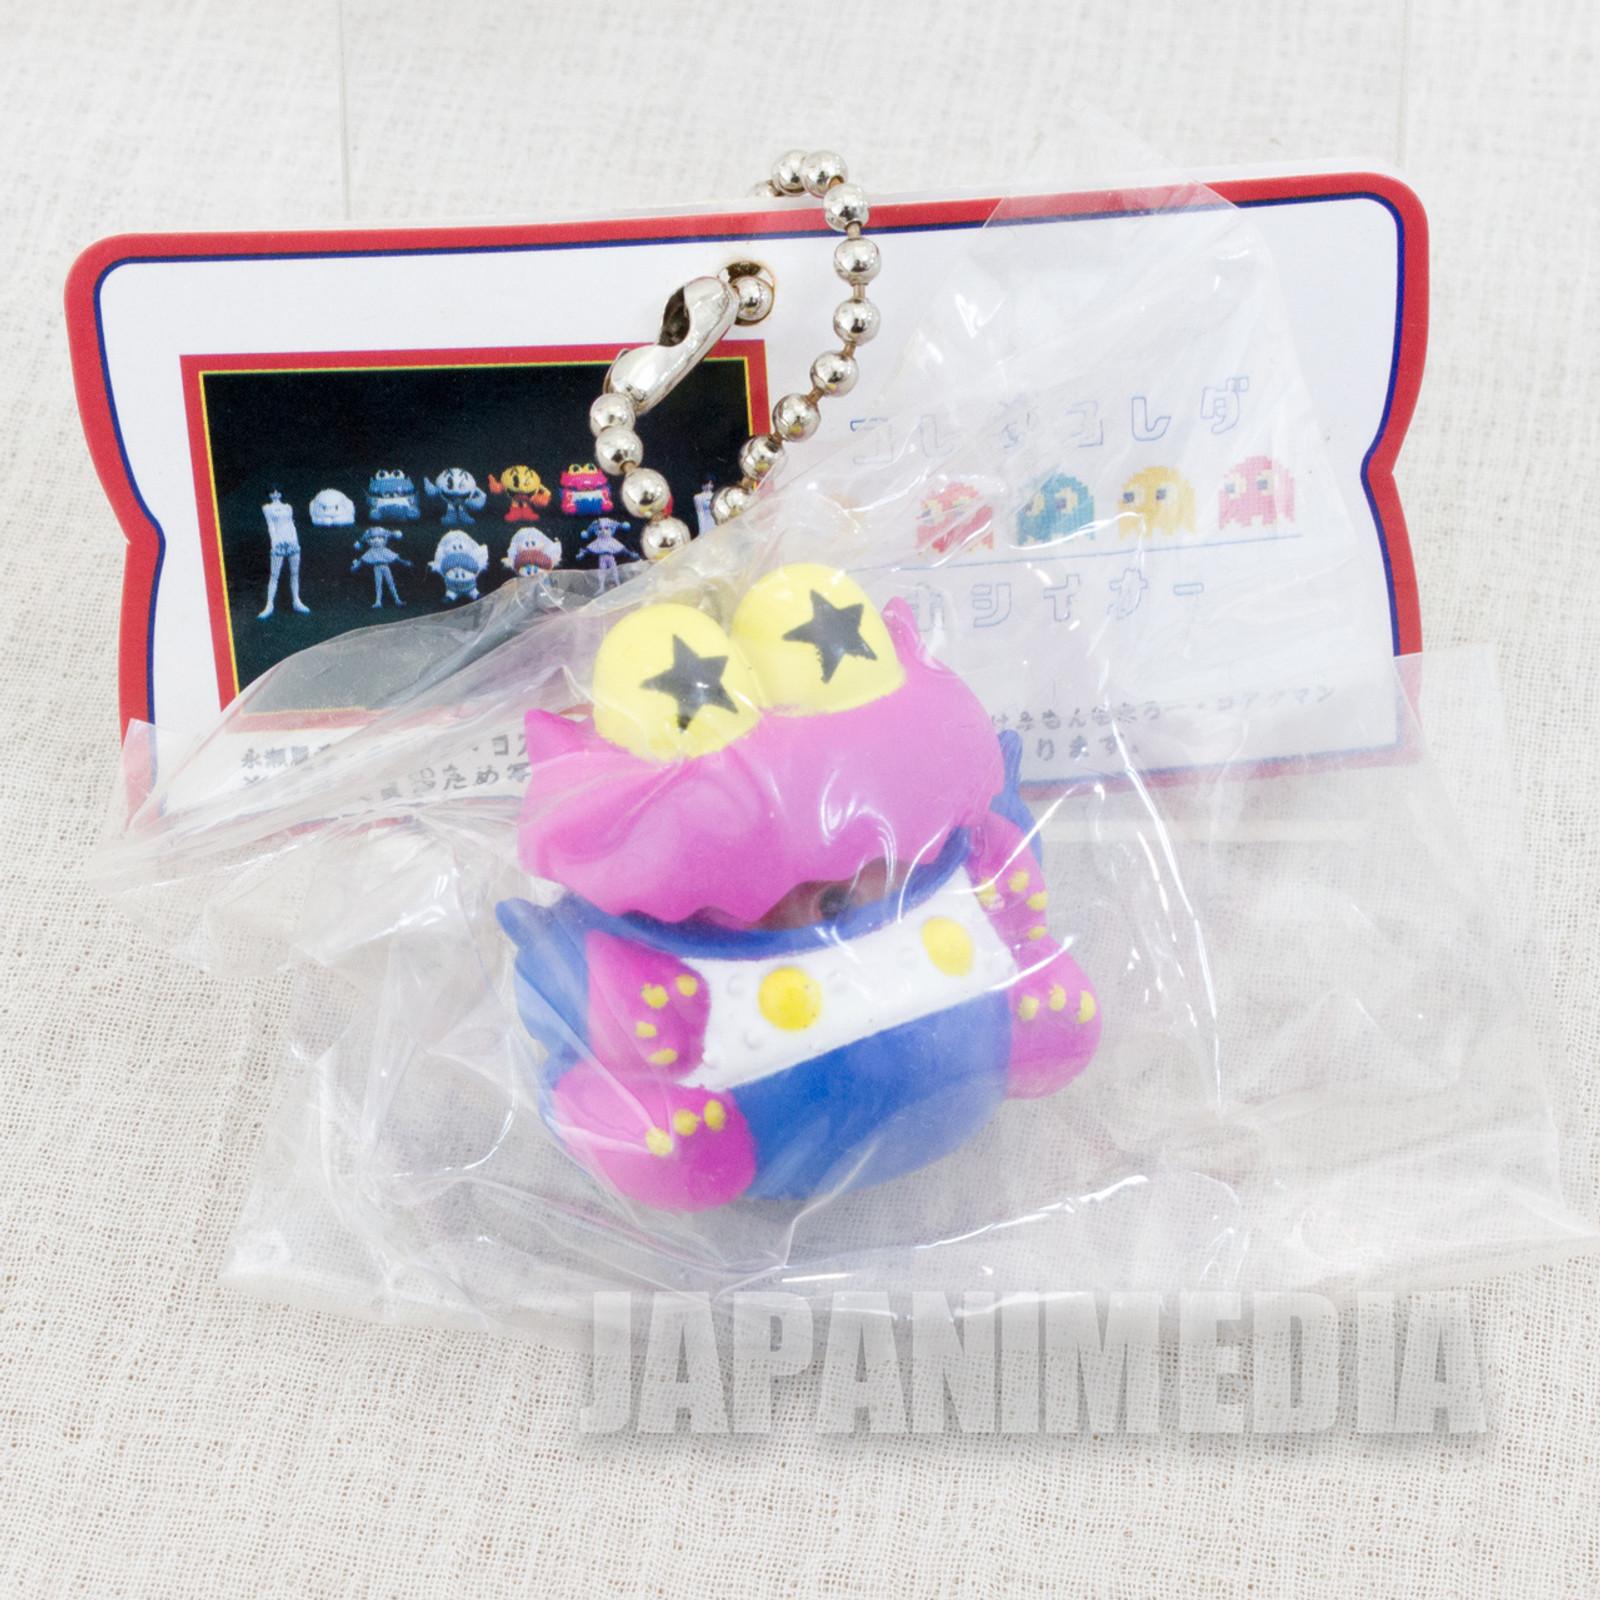 Retro Rare! CosmoGangs Color Figure Ballchain Namco JAPAN